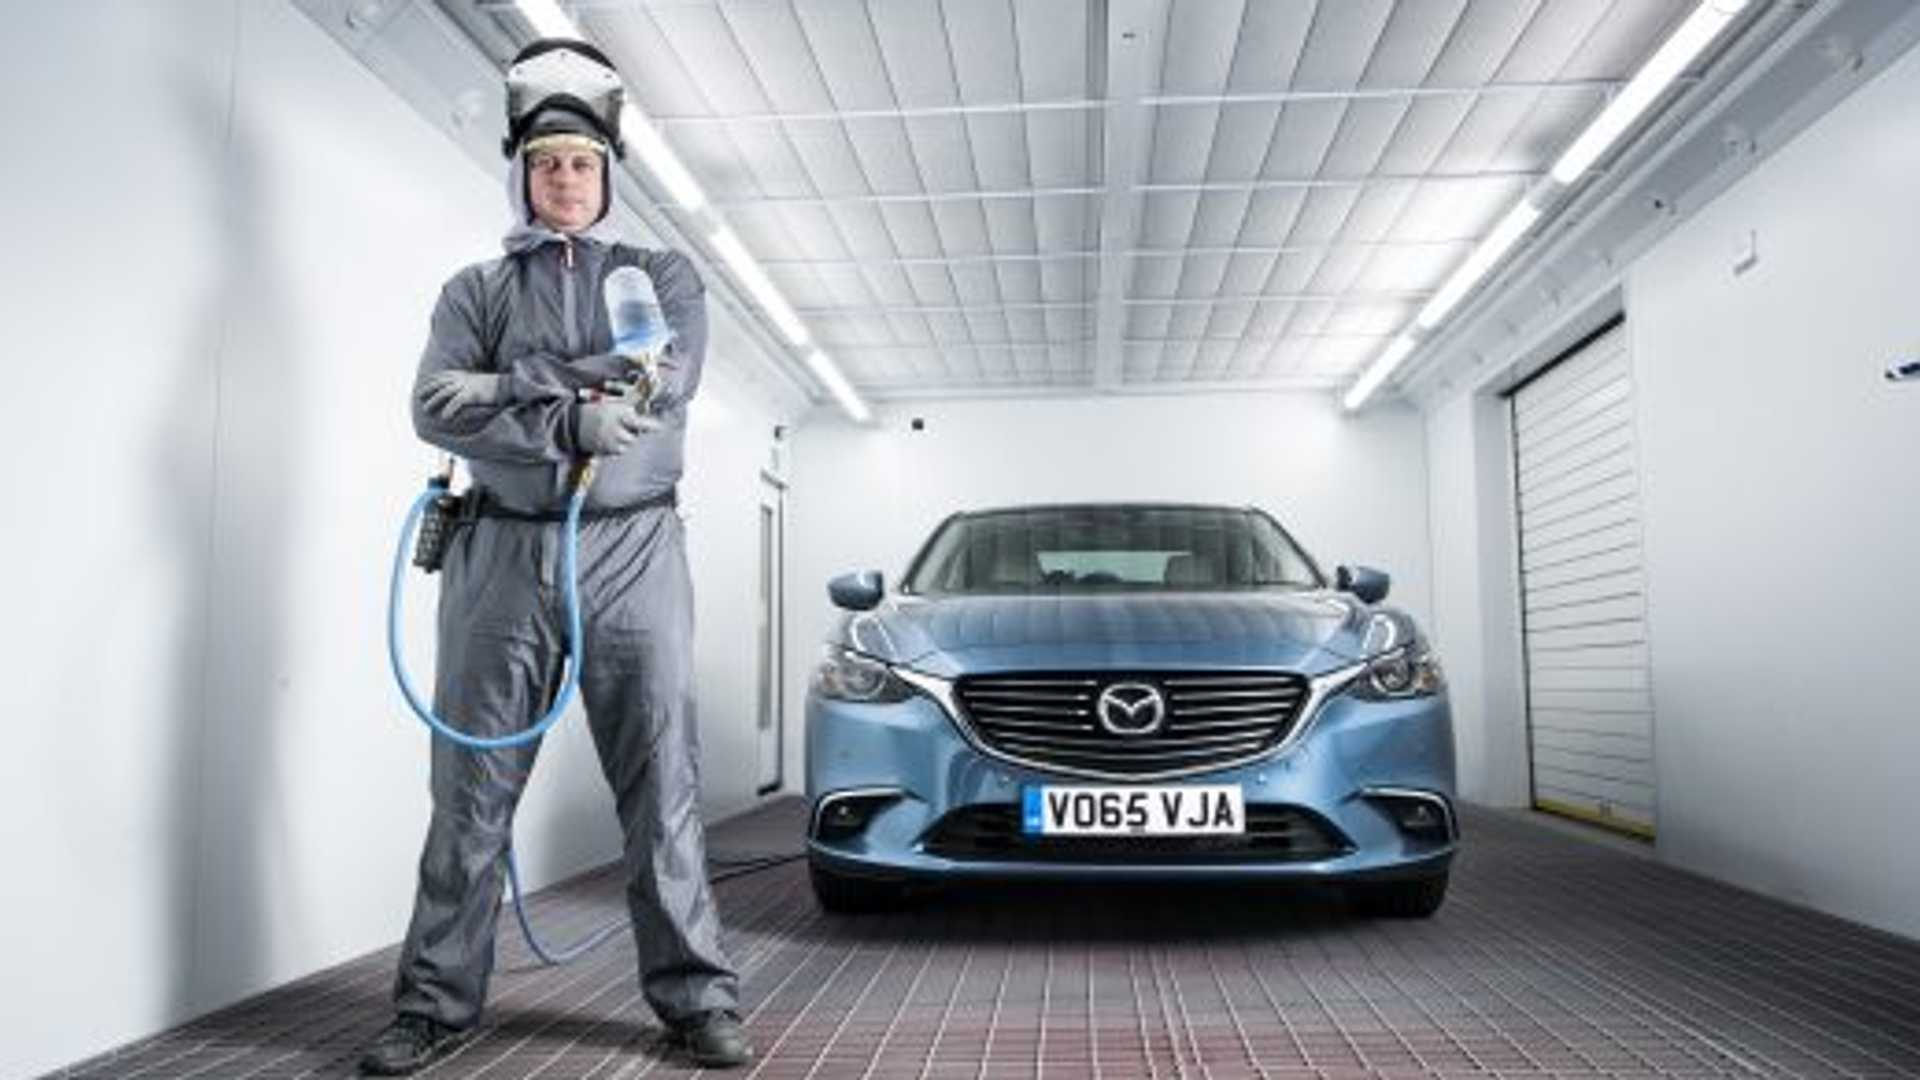 Kelebihan Mazda Servis Review